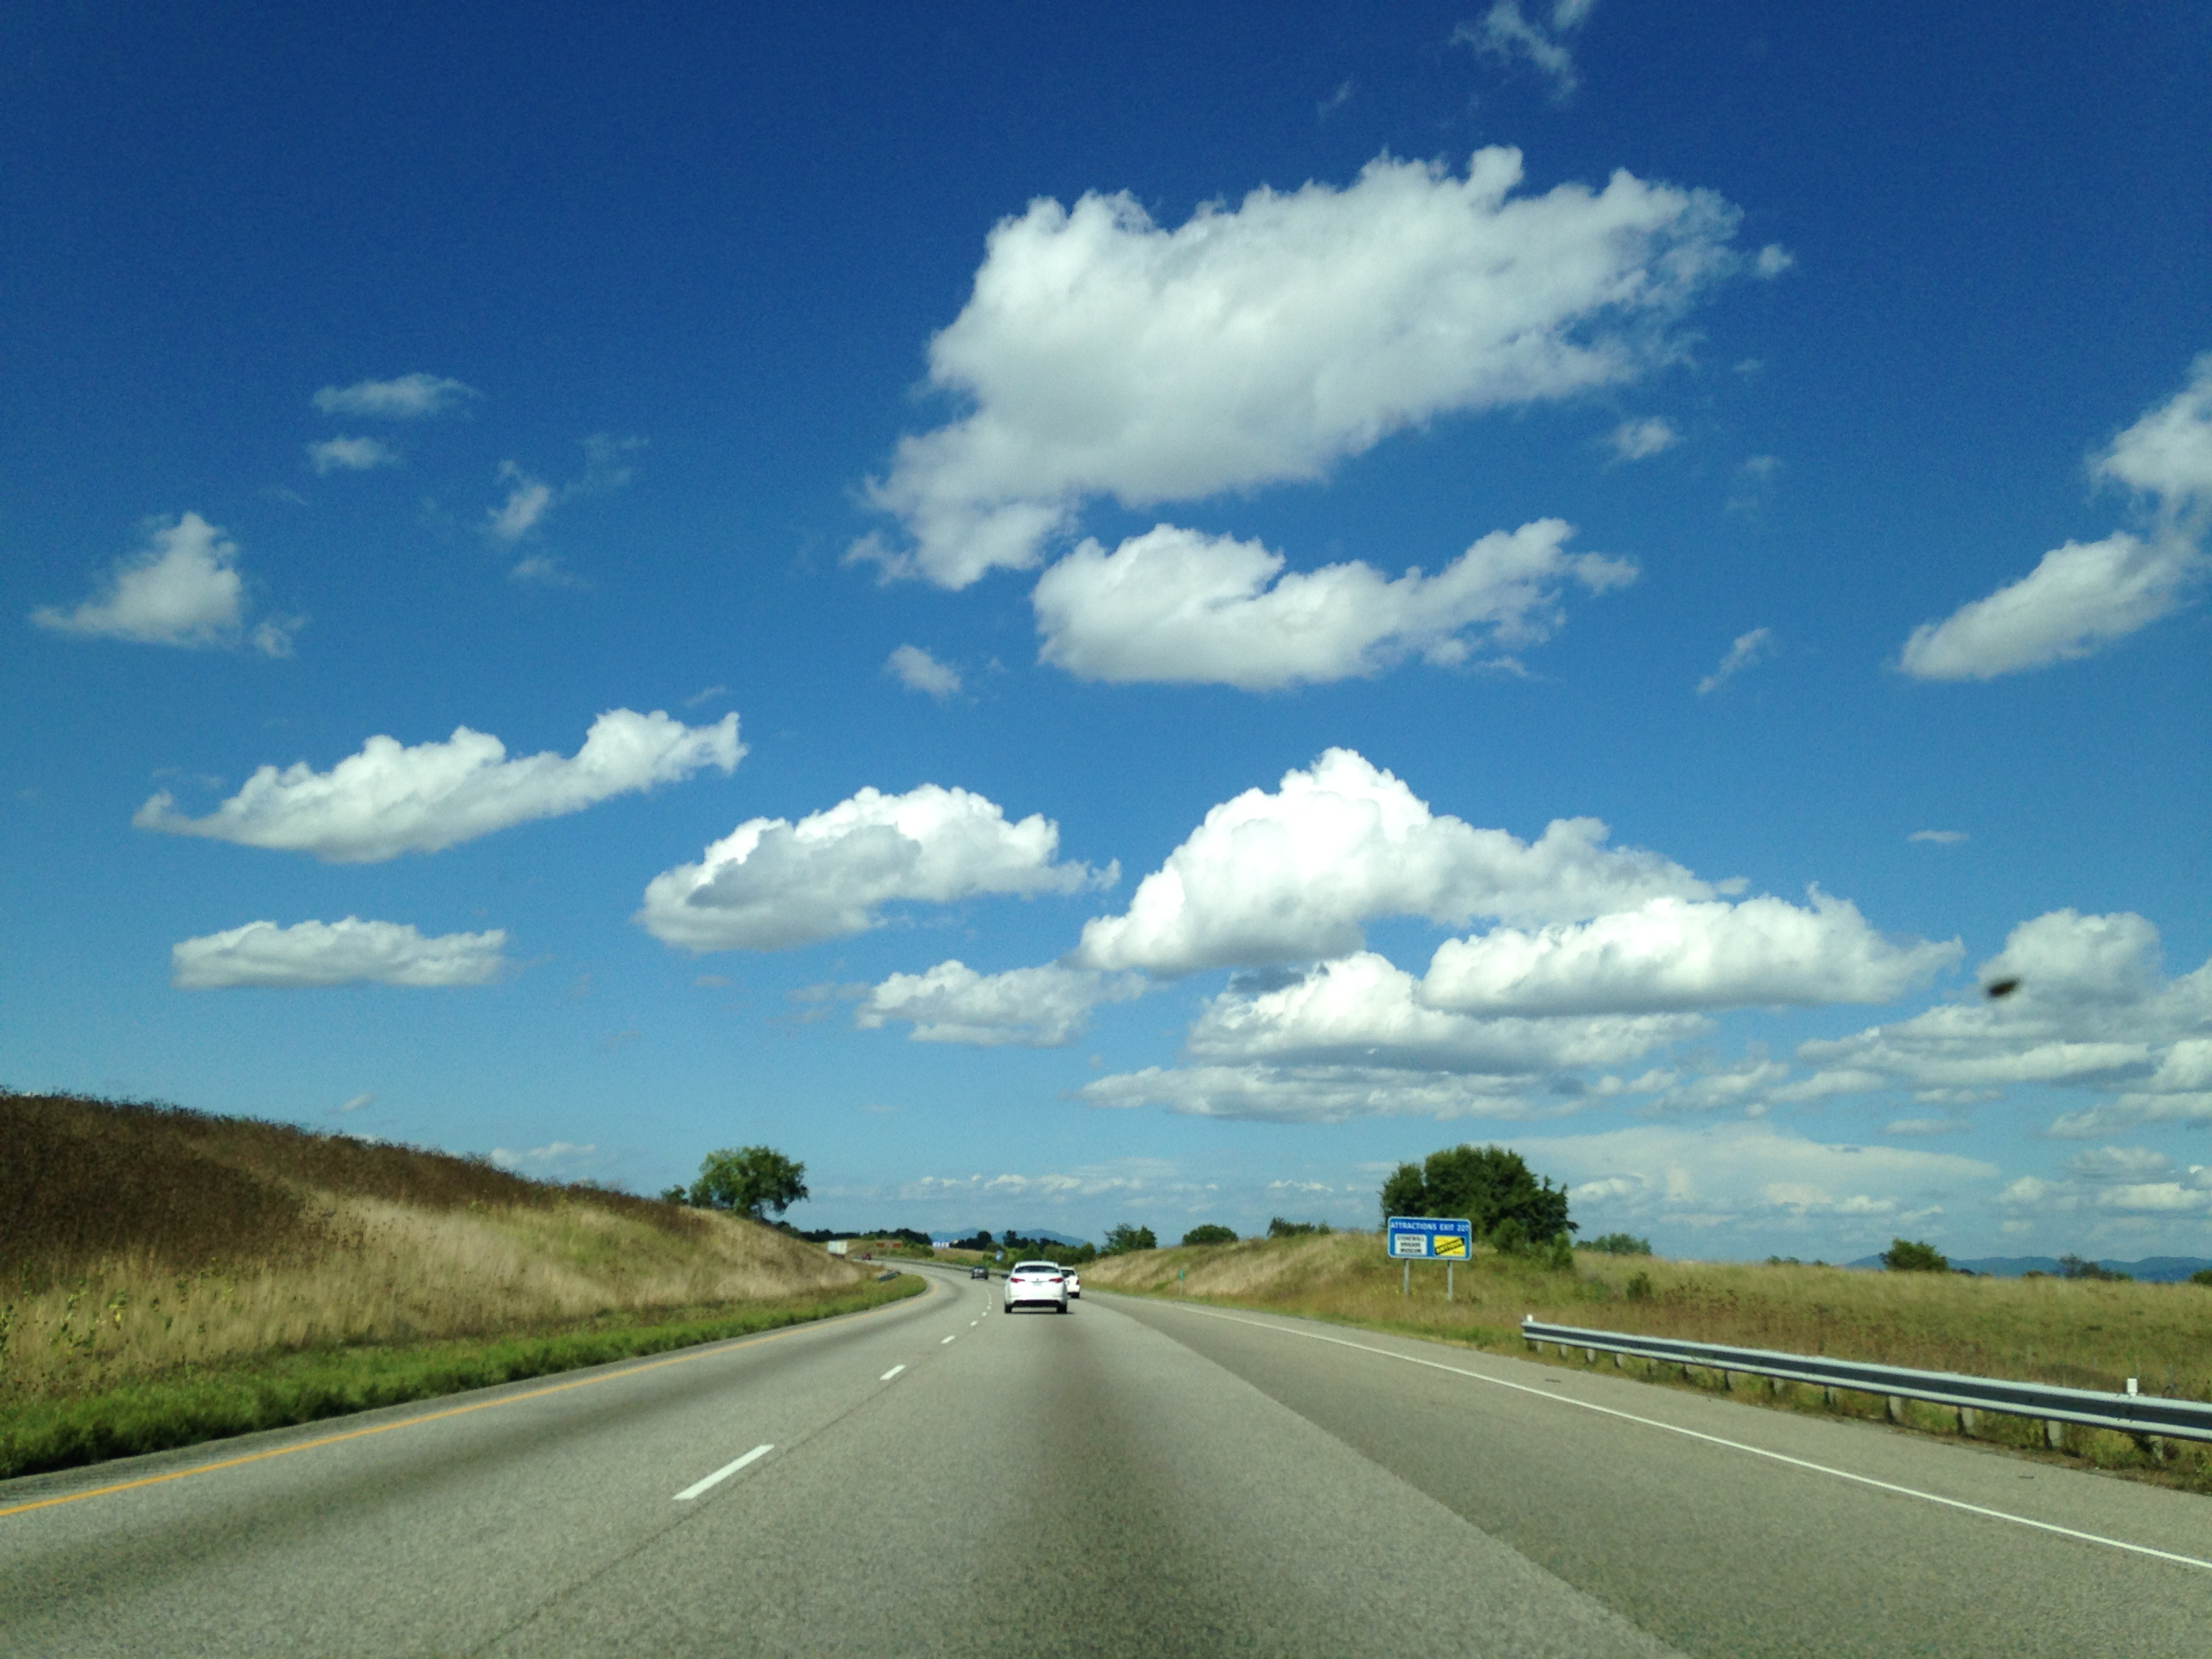 Road Trip, USA